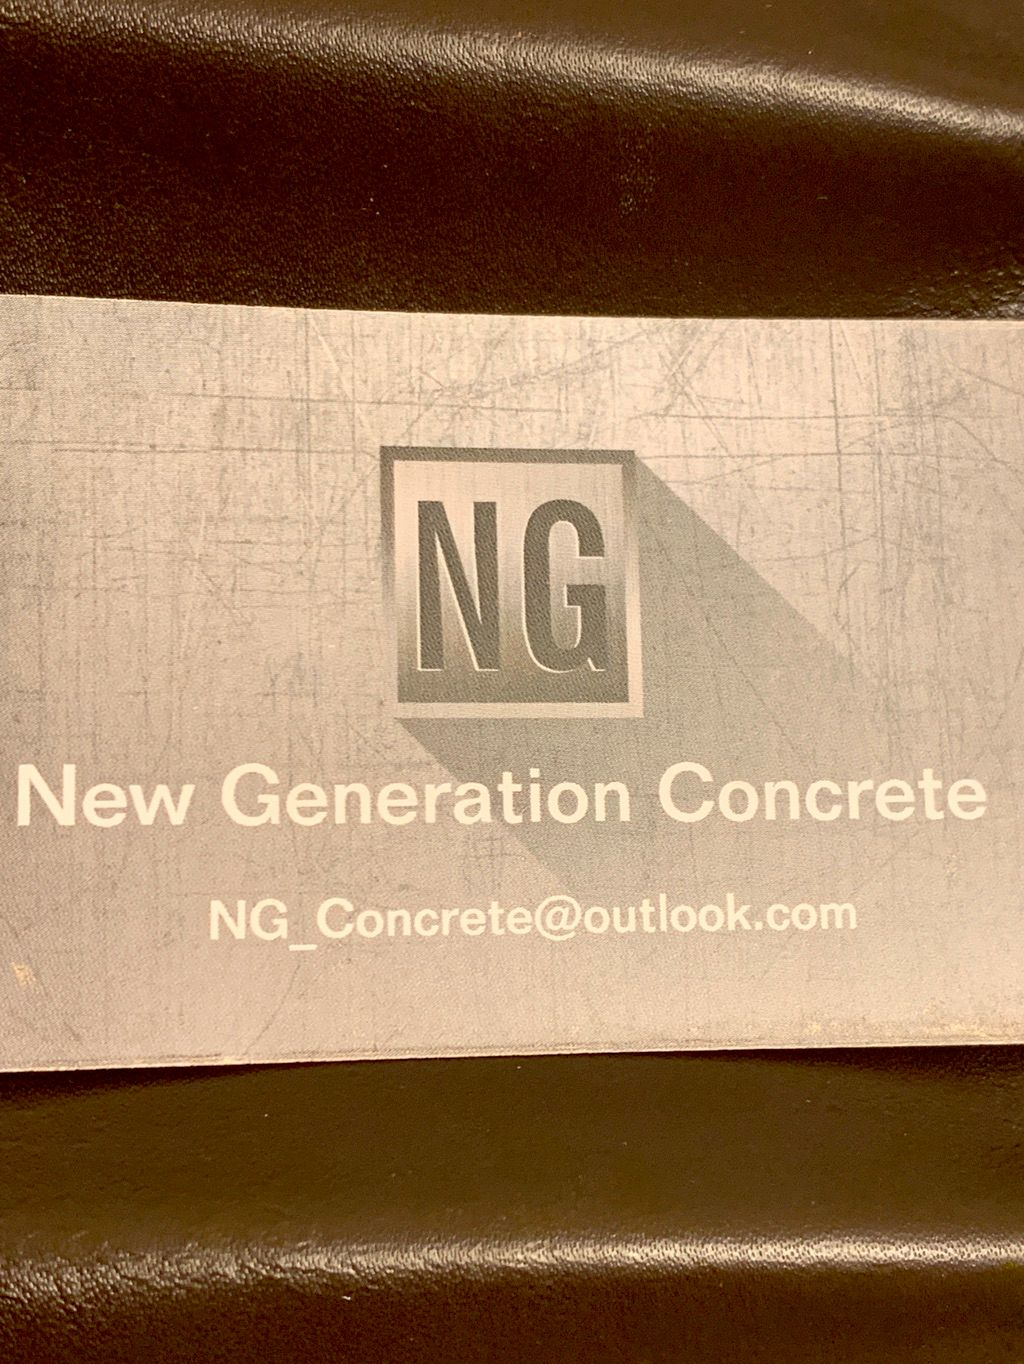 New Generation Concrete